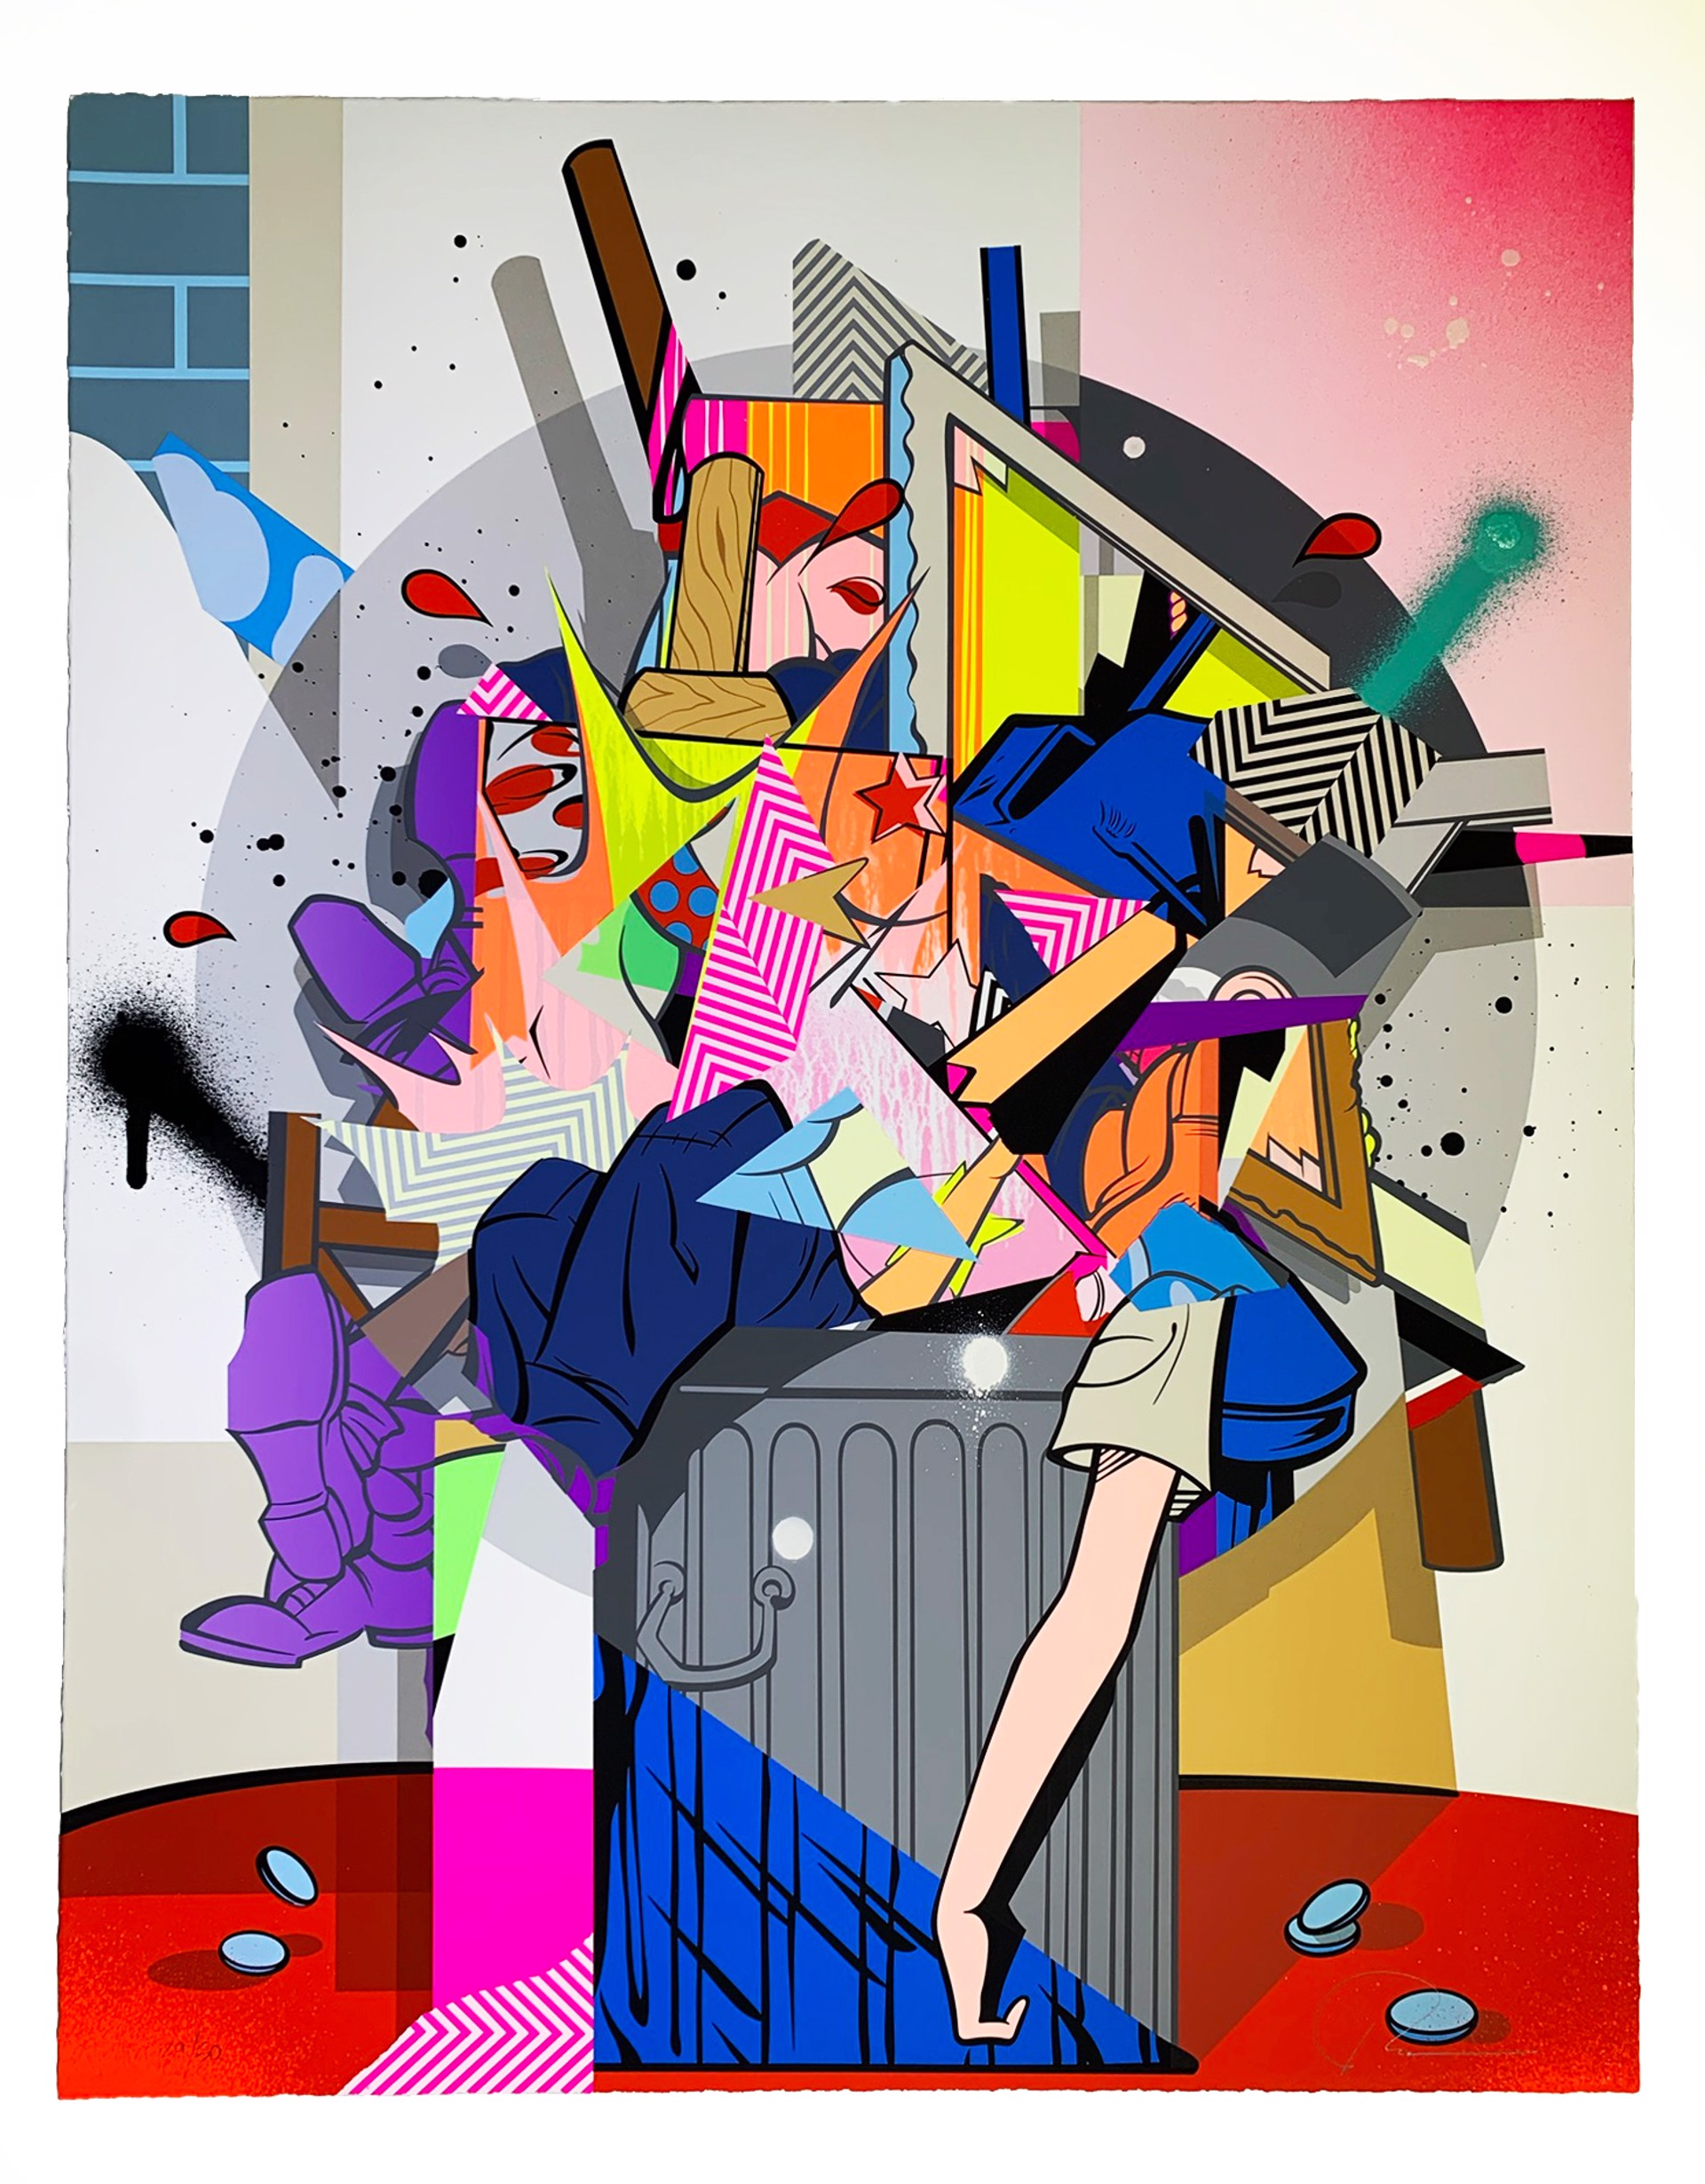 Junk Drawer by POSE